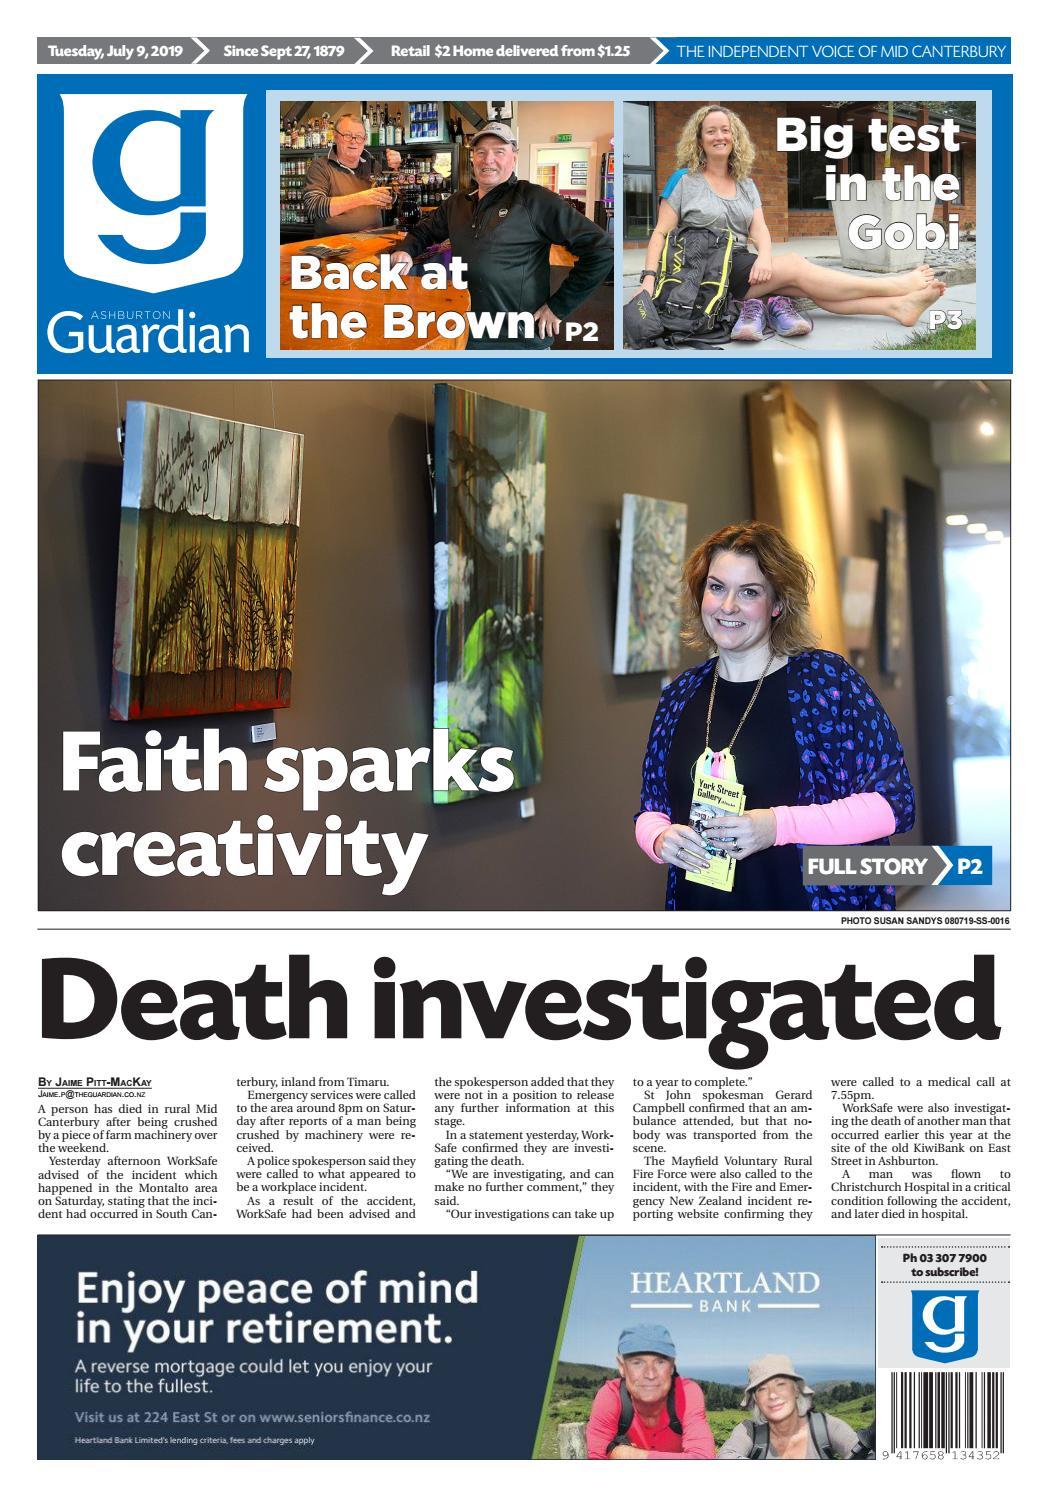 Ashburton Guardian, Tuesday, July 9, 2019